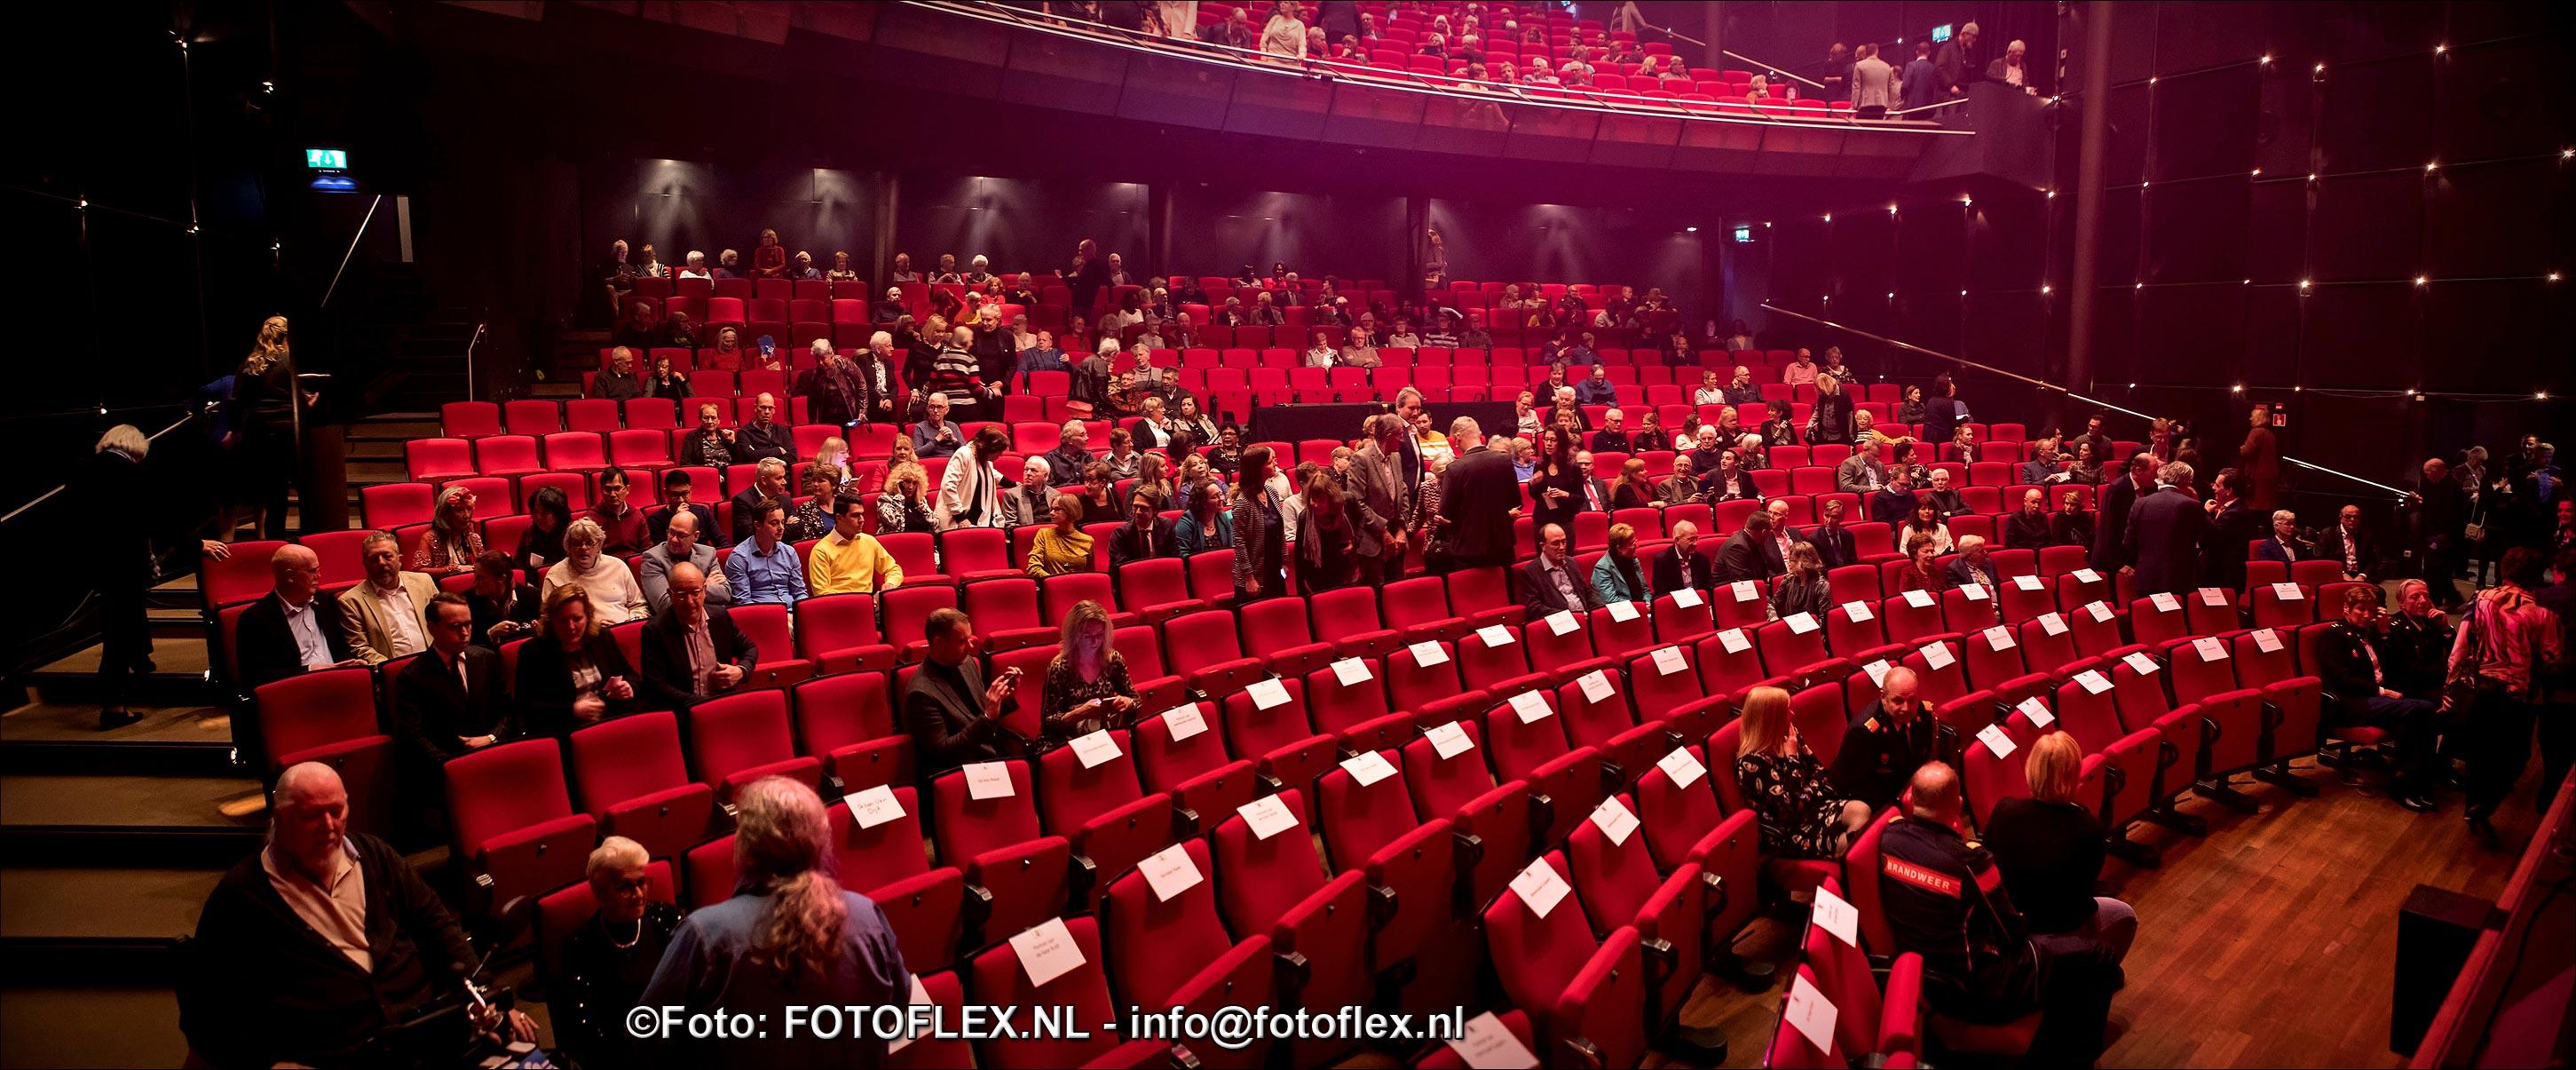 0216-0220-CopyrightFOTOFLEX.NL-07012020